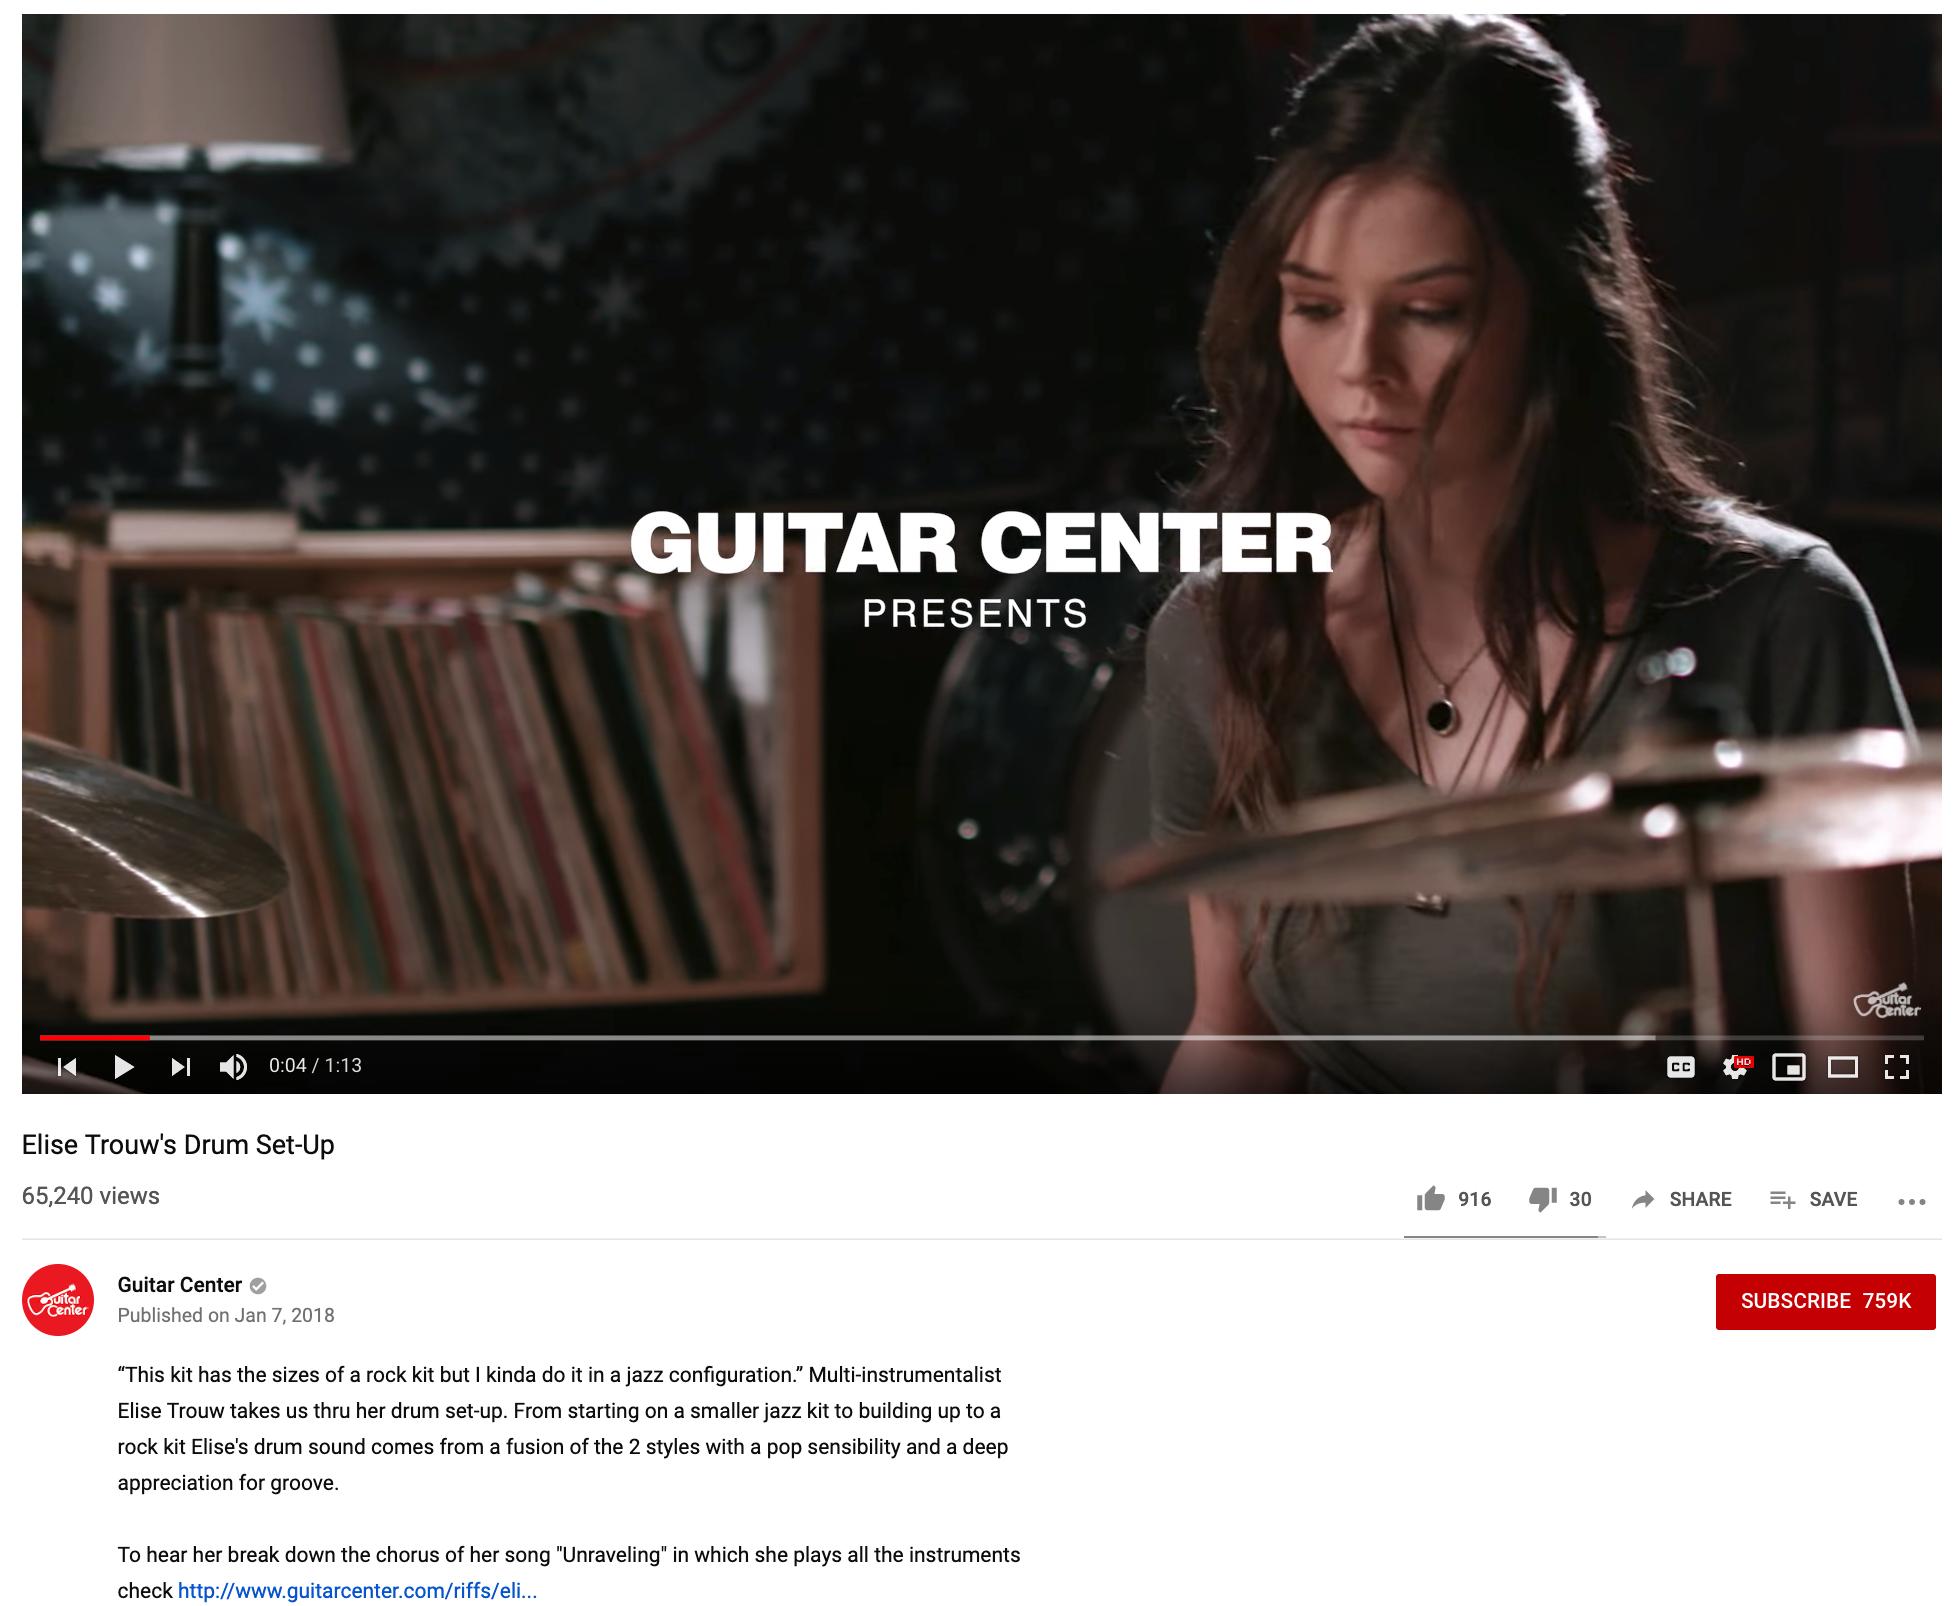 Guitar Center YouTube